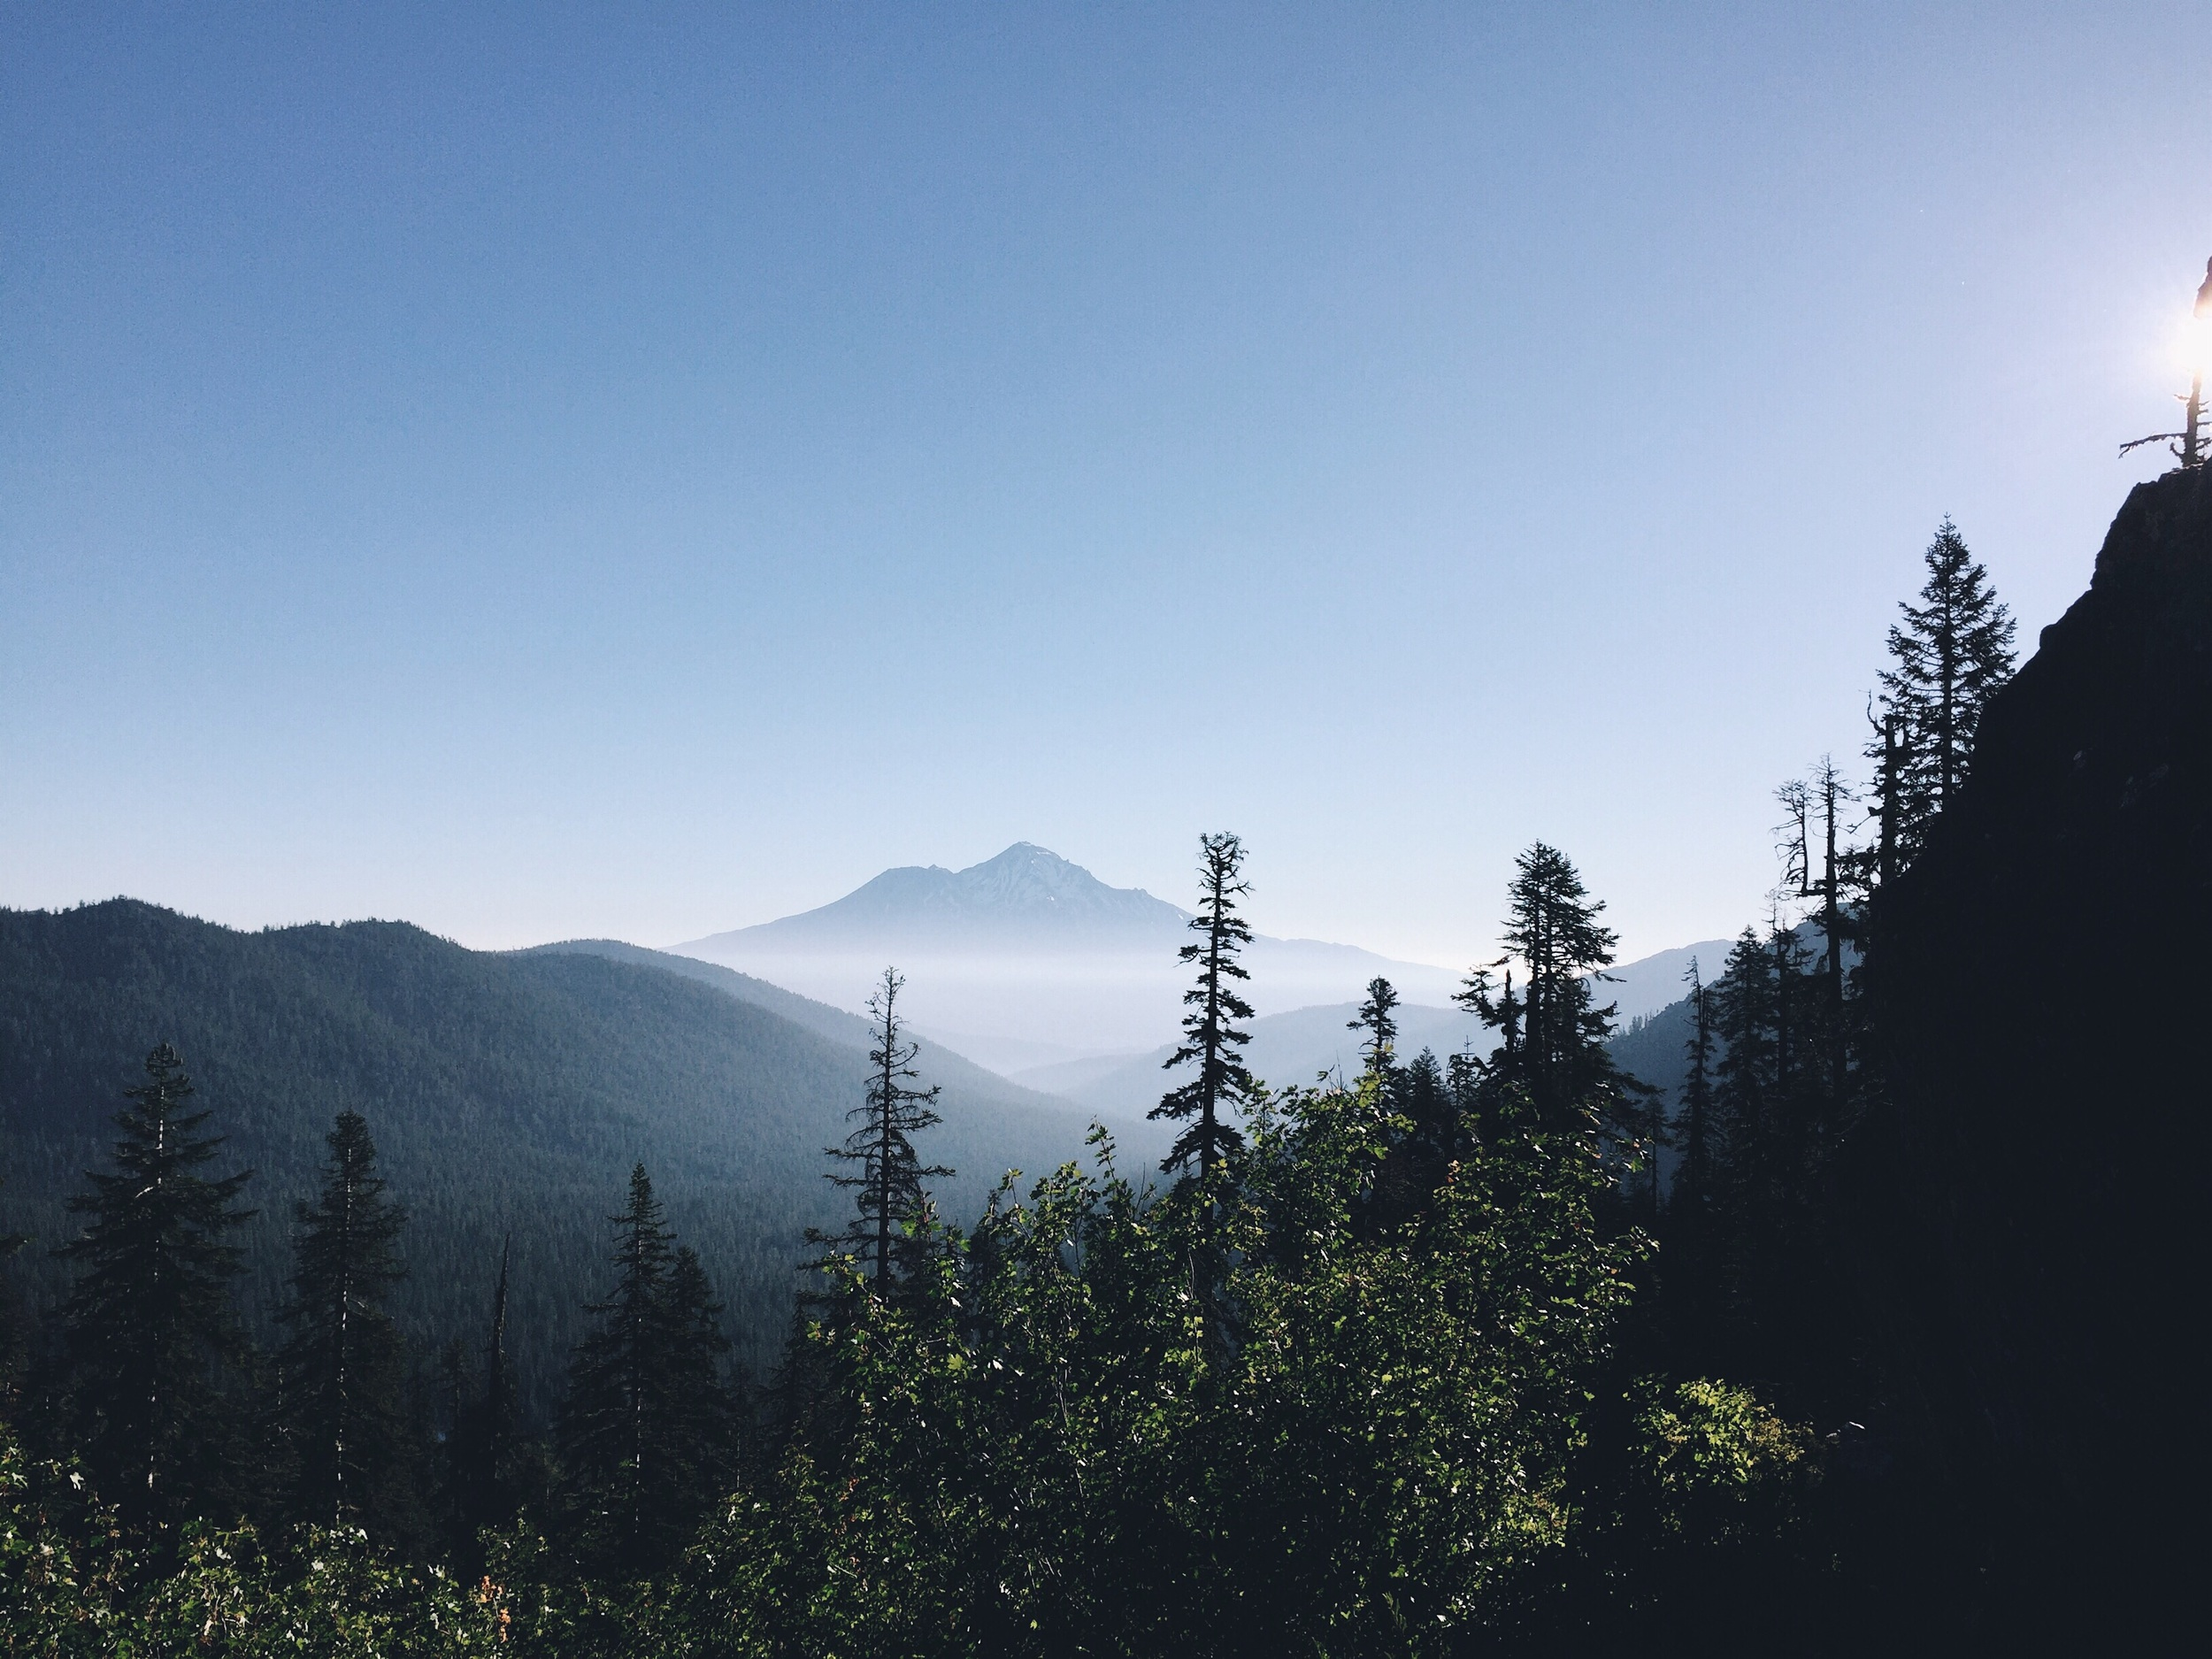 Pretty Shasta in the haze.